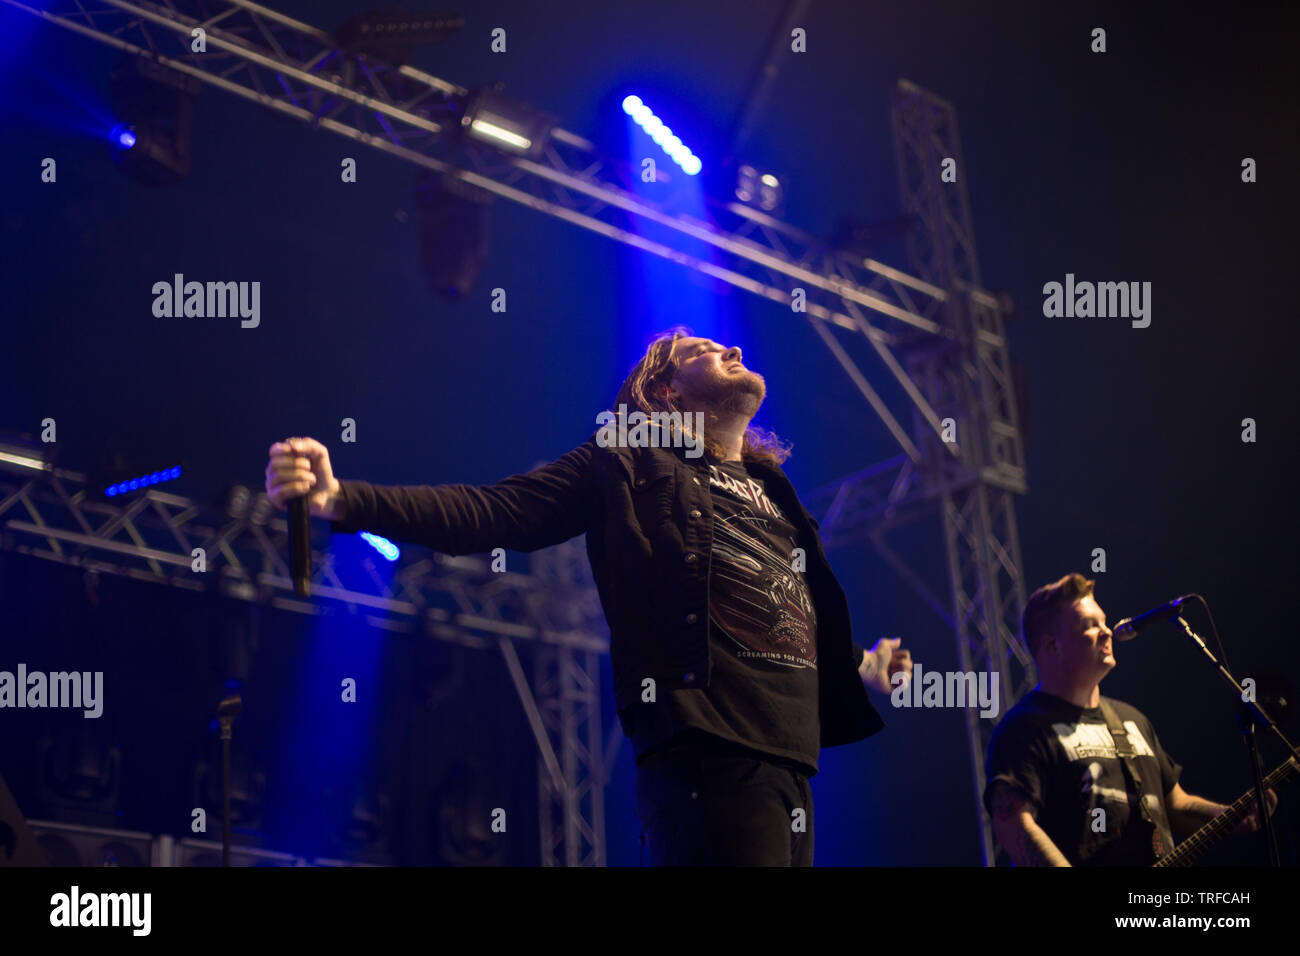 wage war live at slam dunk festival 2019 - Stock Image